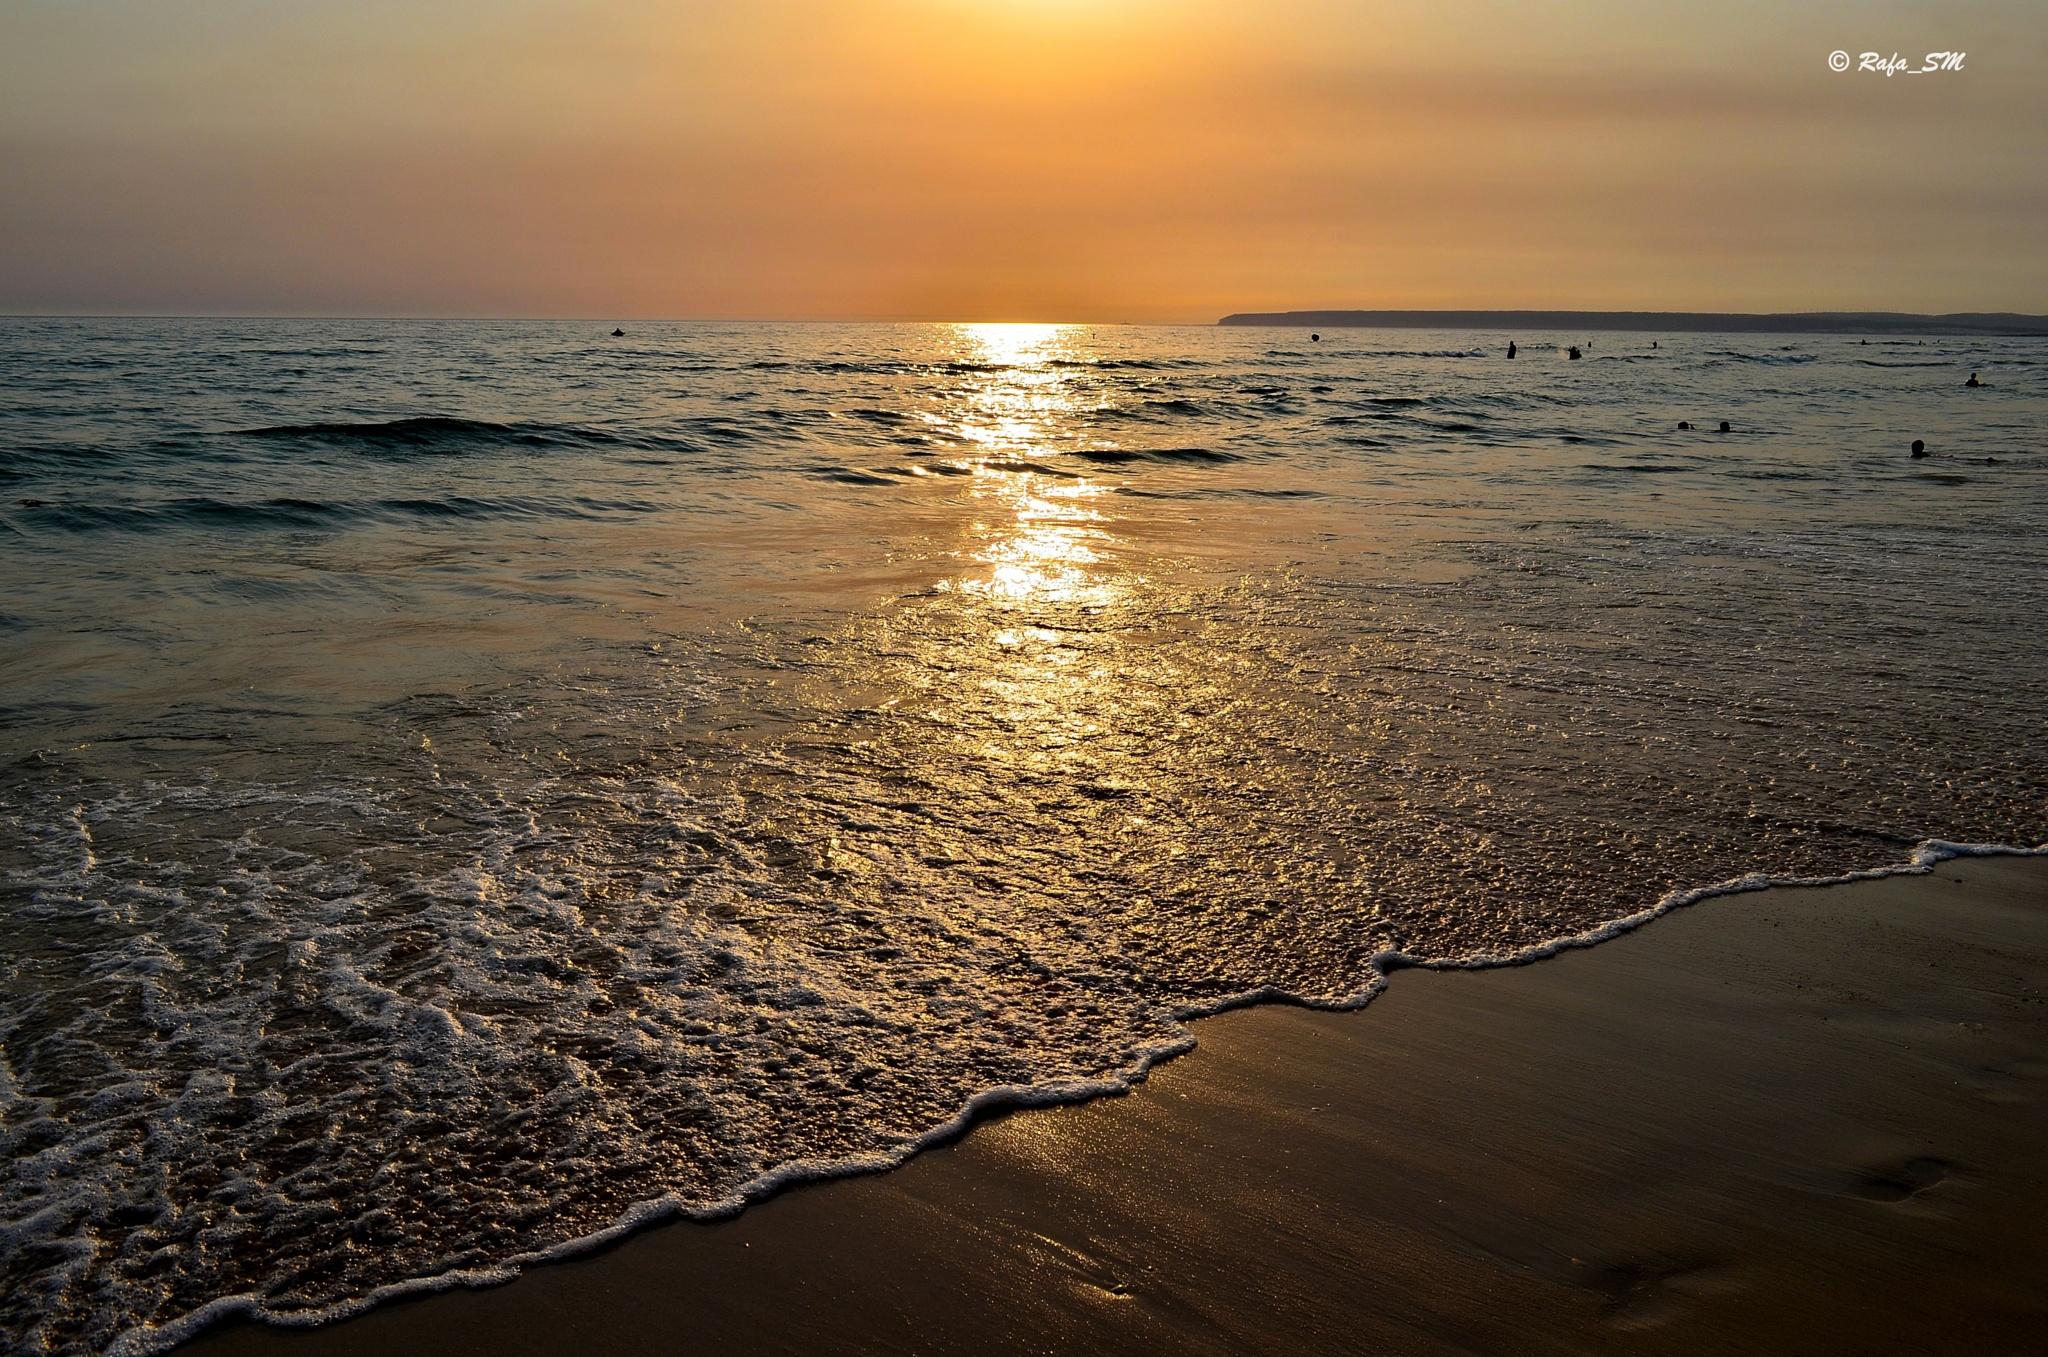 Sunset by RafaelSM